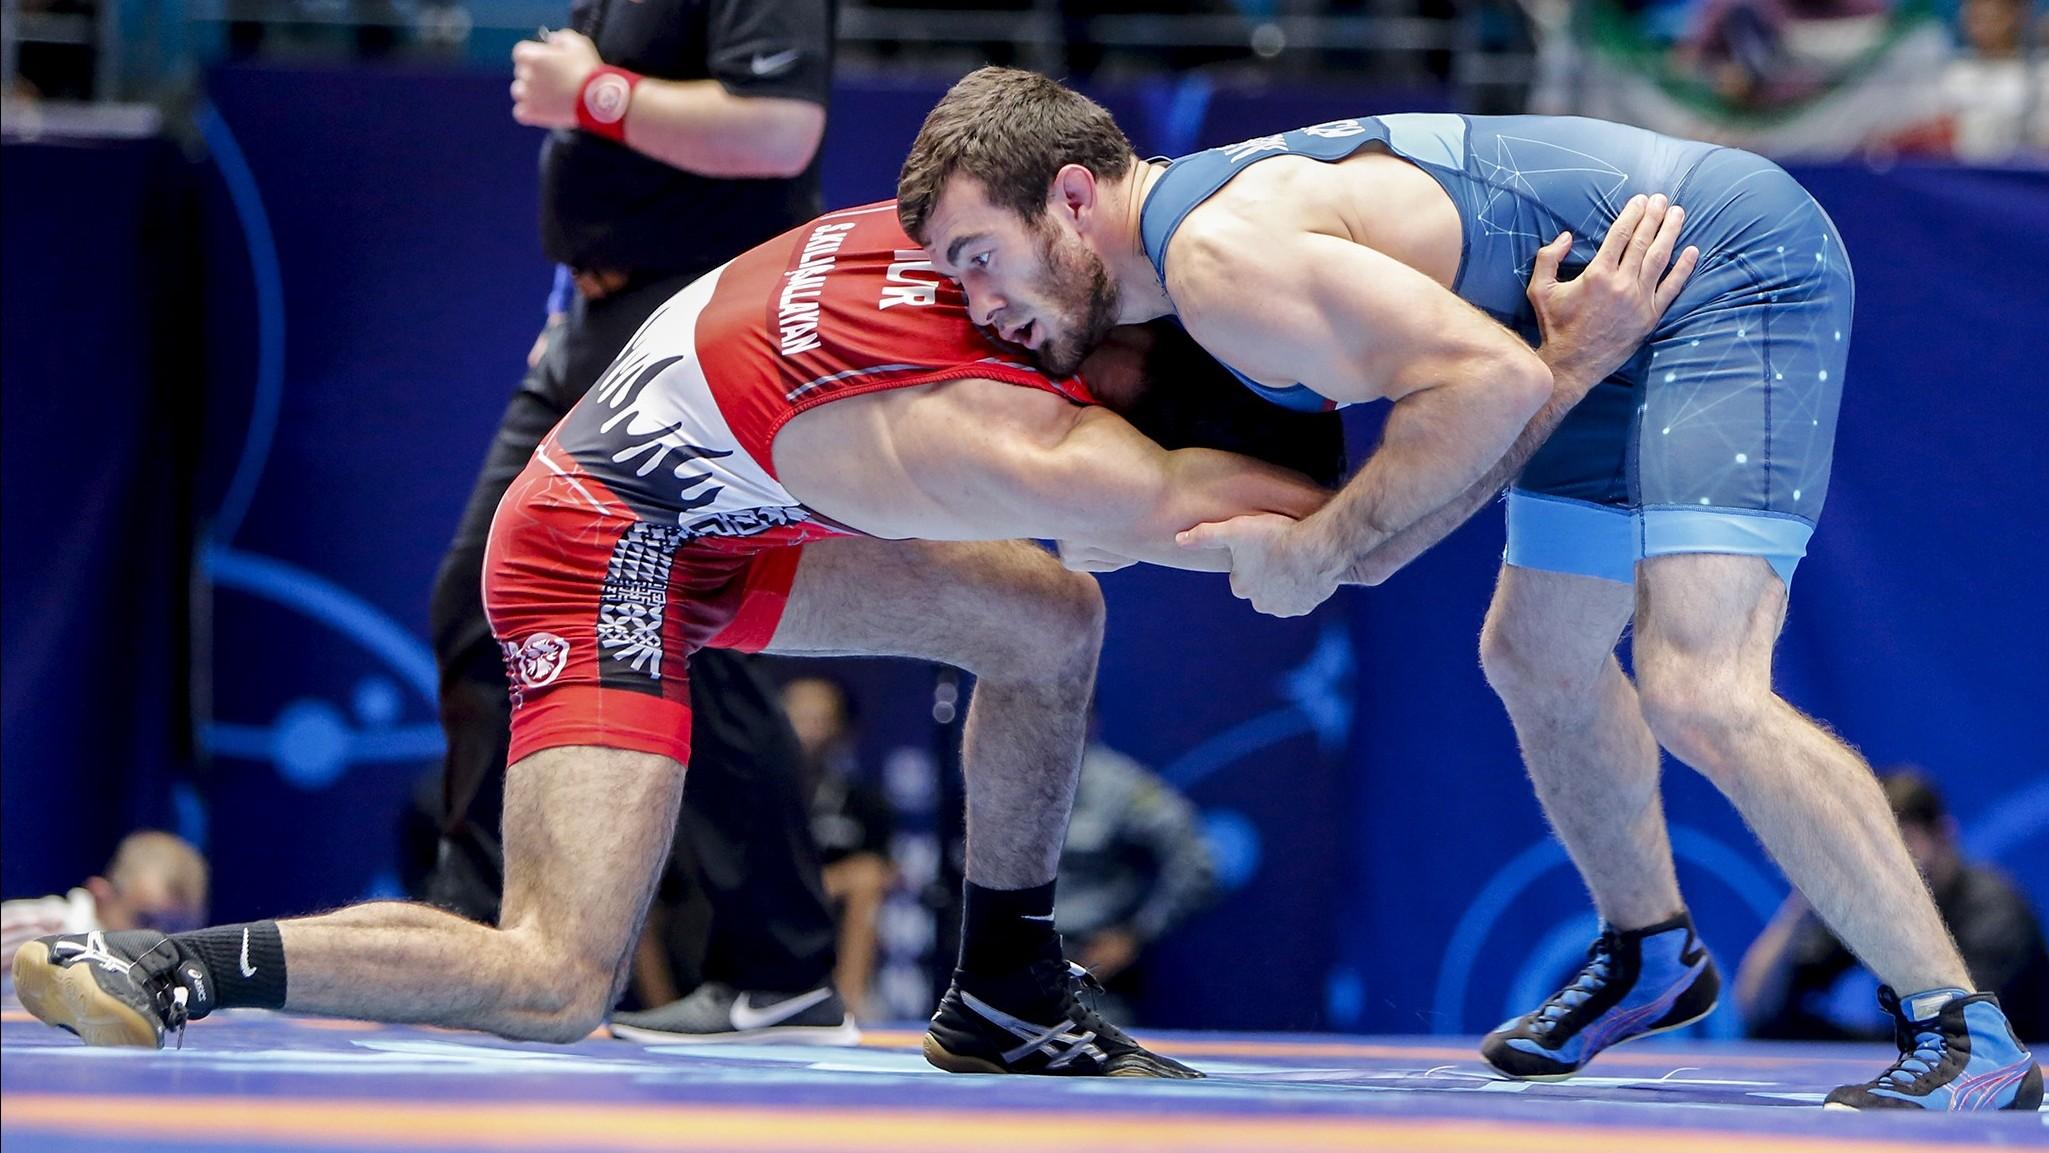 Muszukajev Iszmail a címvédőt legyőzve bronzérmes a birkózó vb-n!